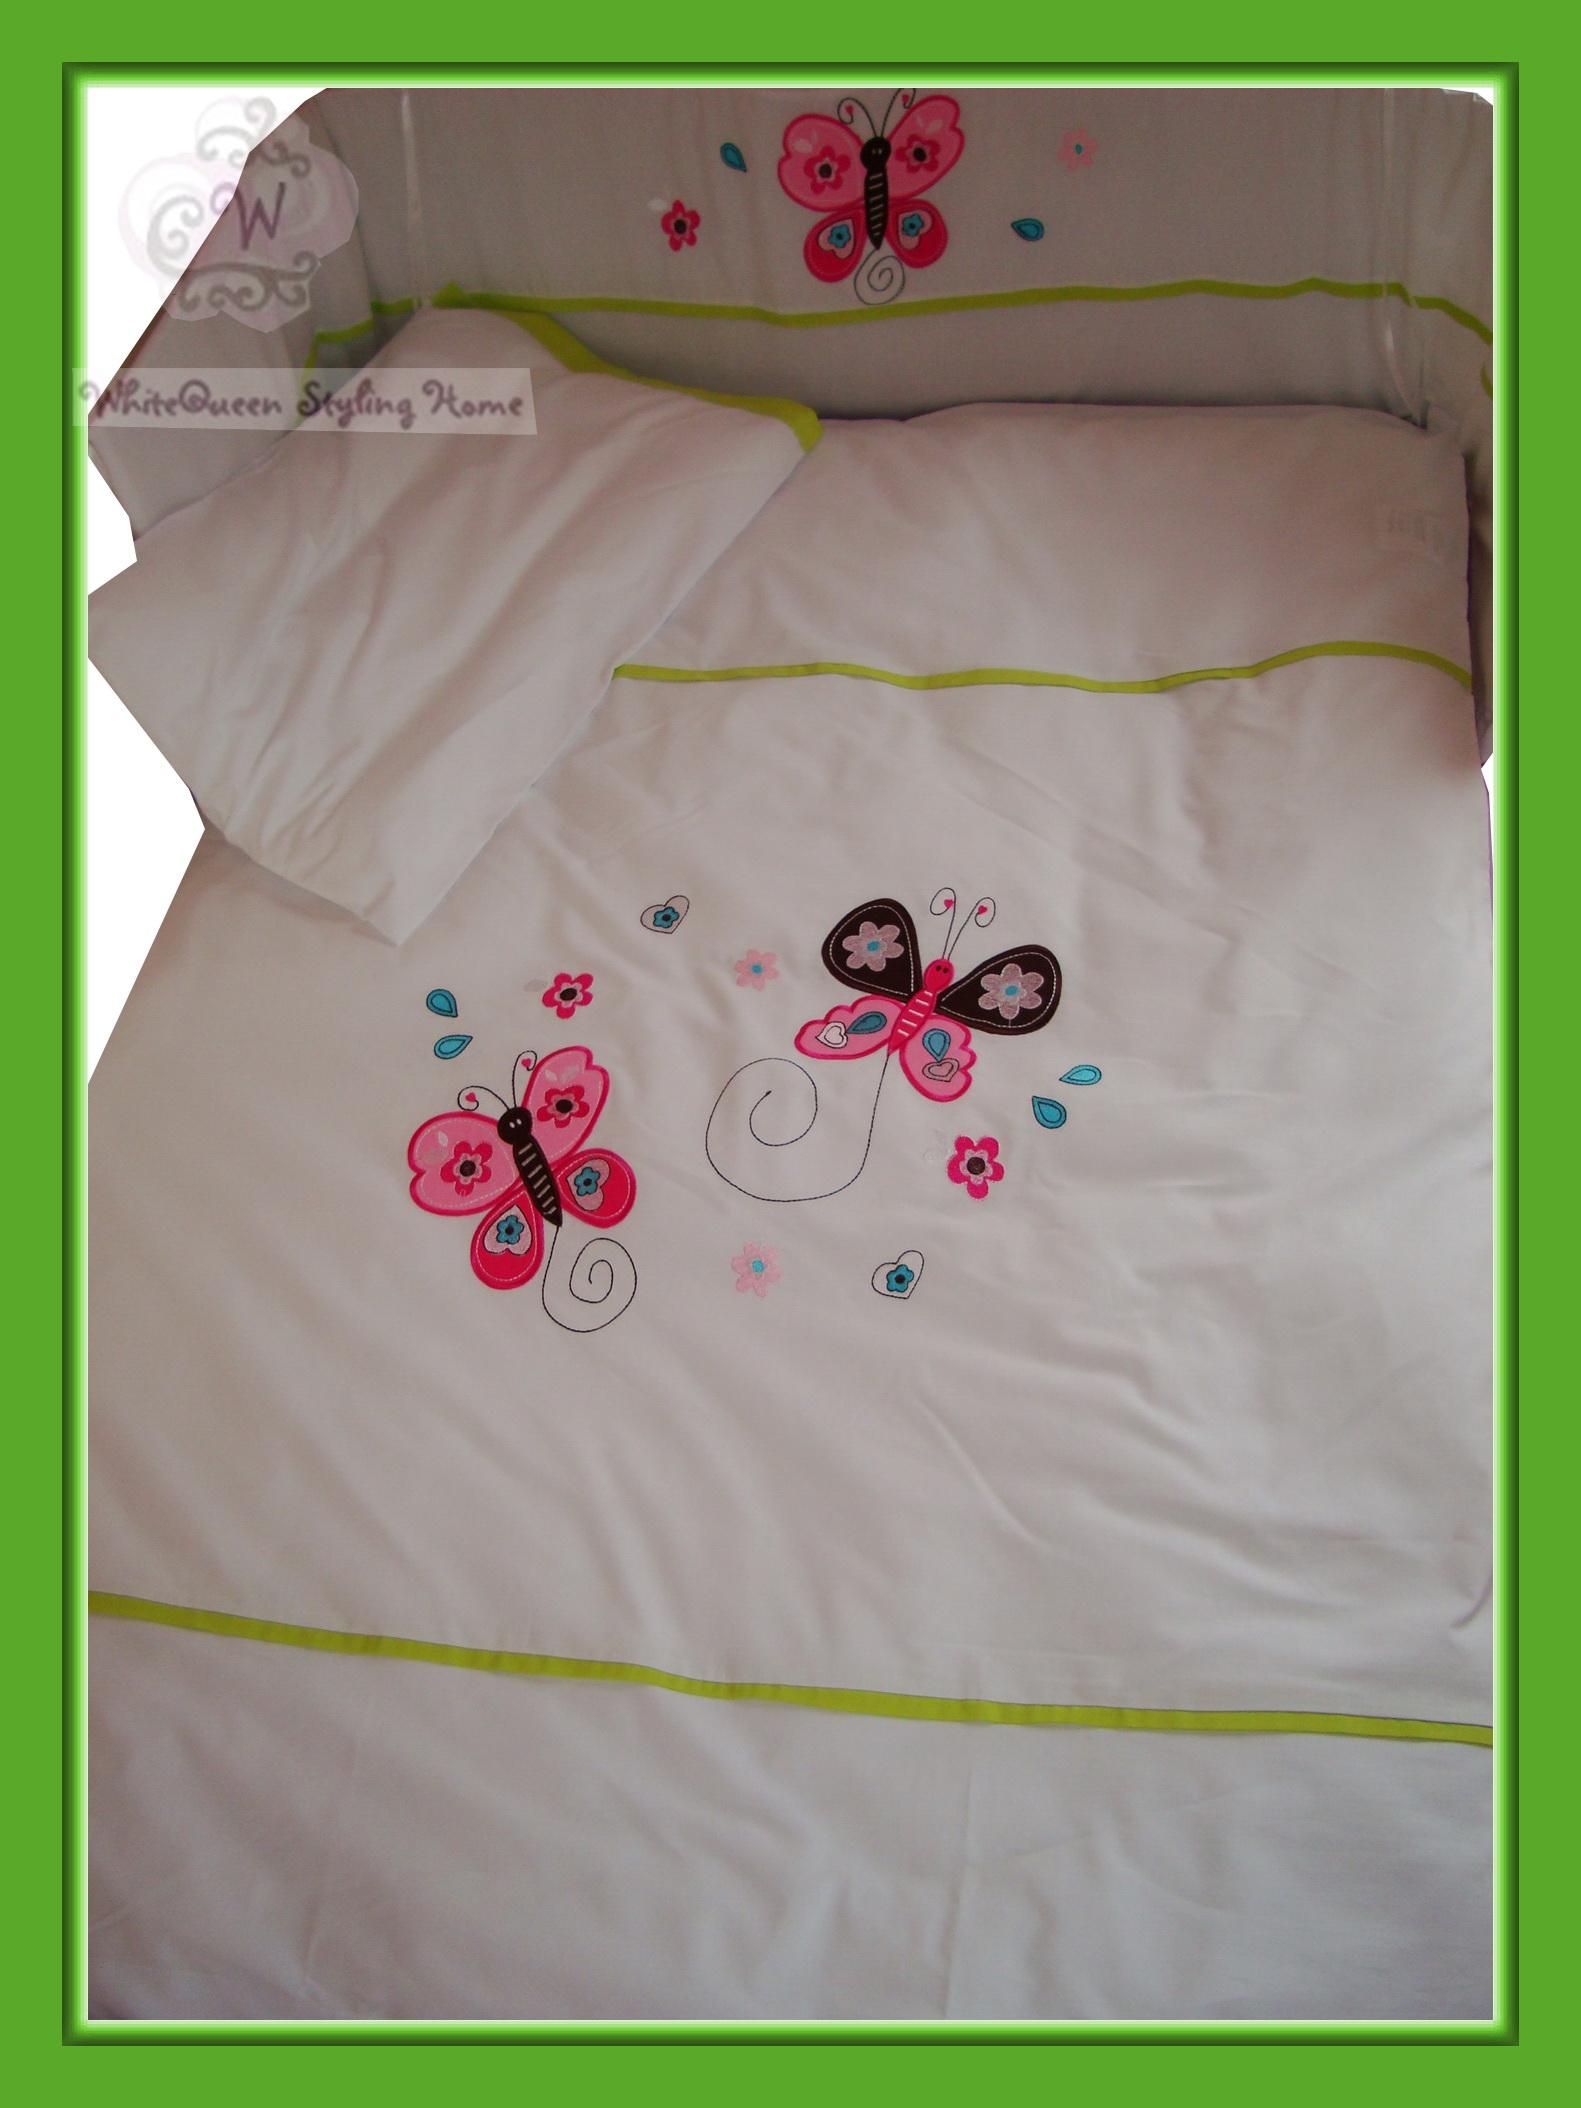 baby bettw sche set schmetterlinge blumen herzen gr n butterfly duvet cover ebay. Black Bedroom Furniture Sets. Home Design Ideas